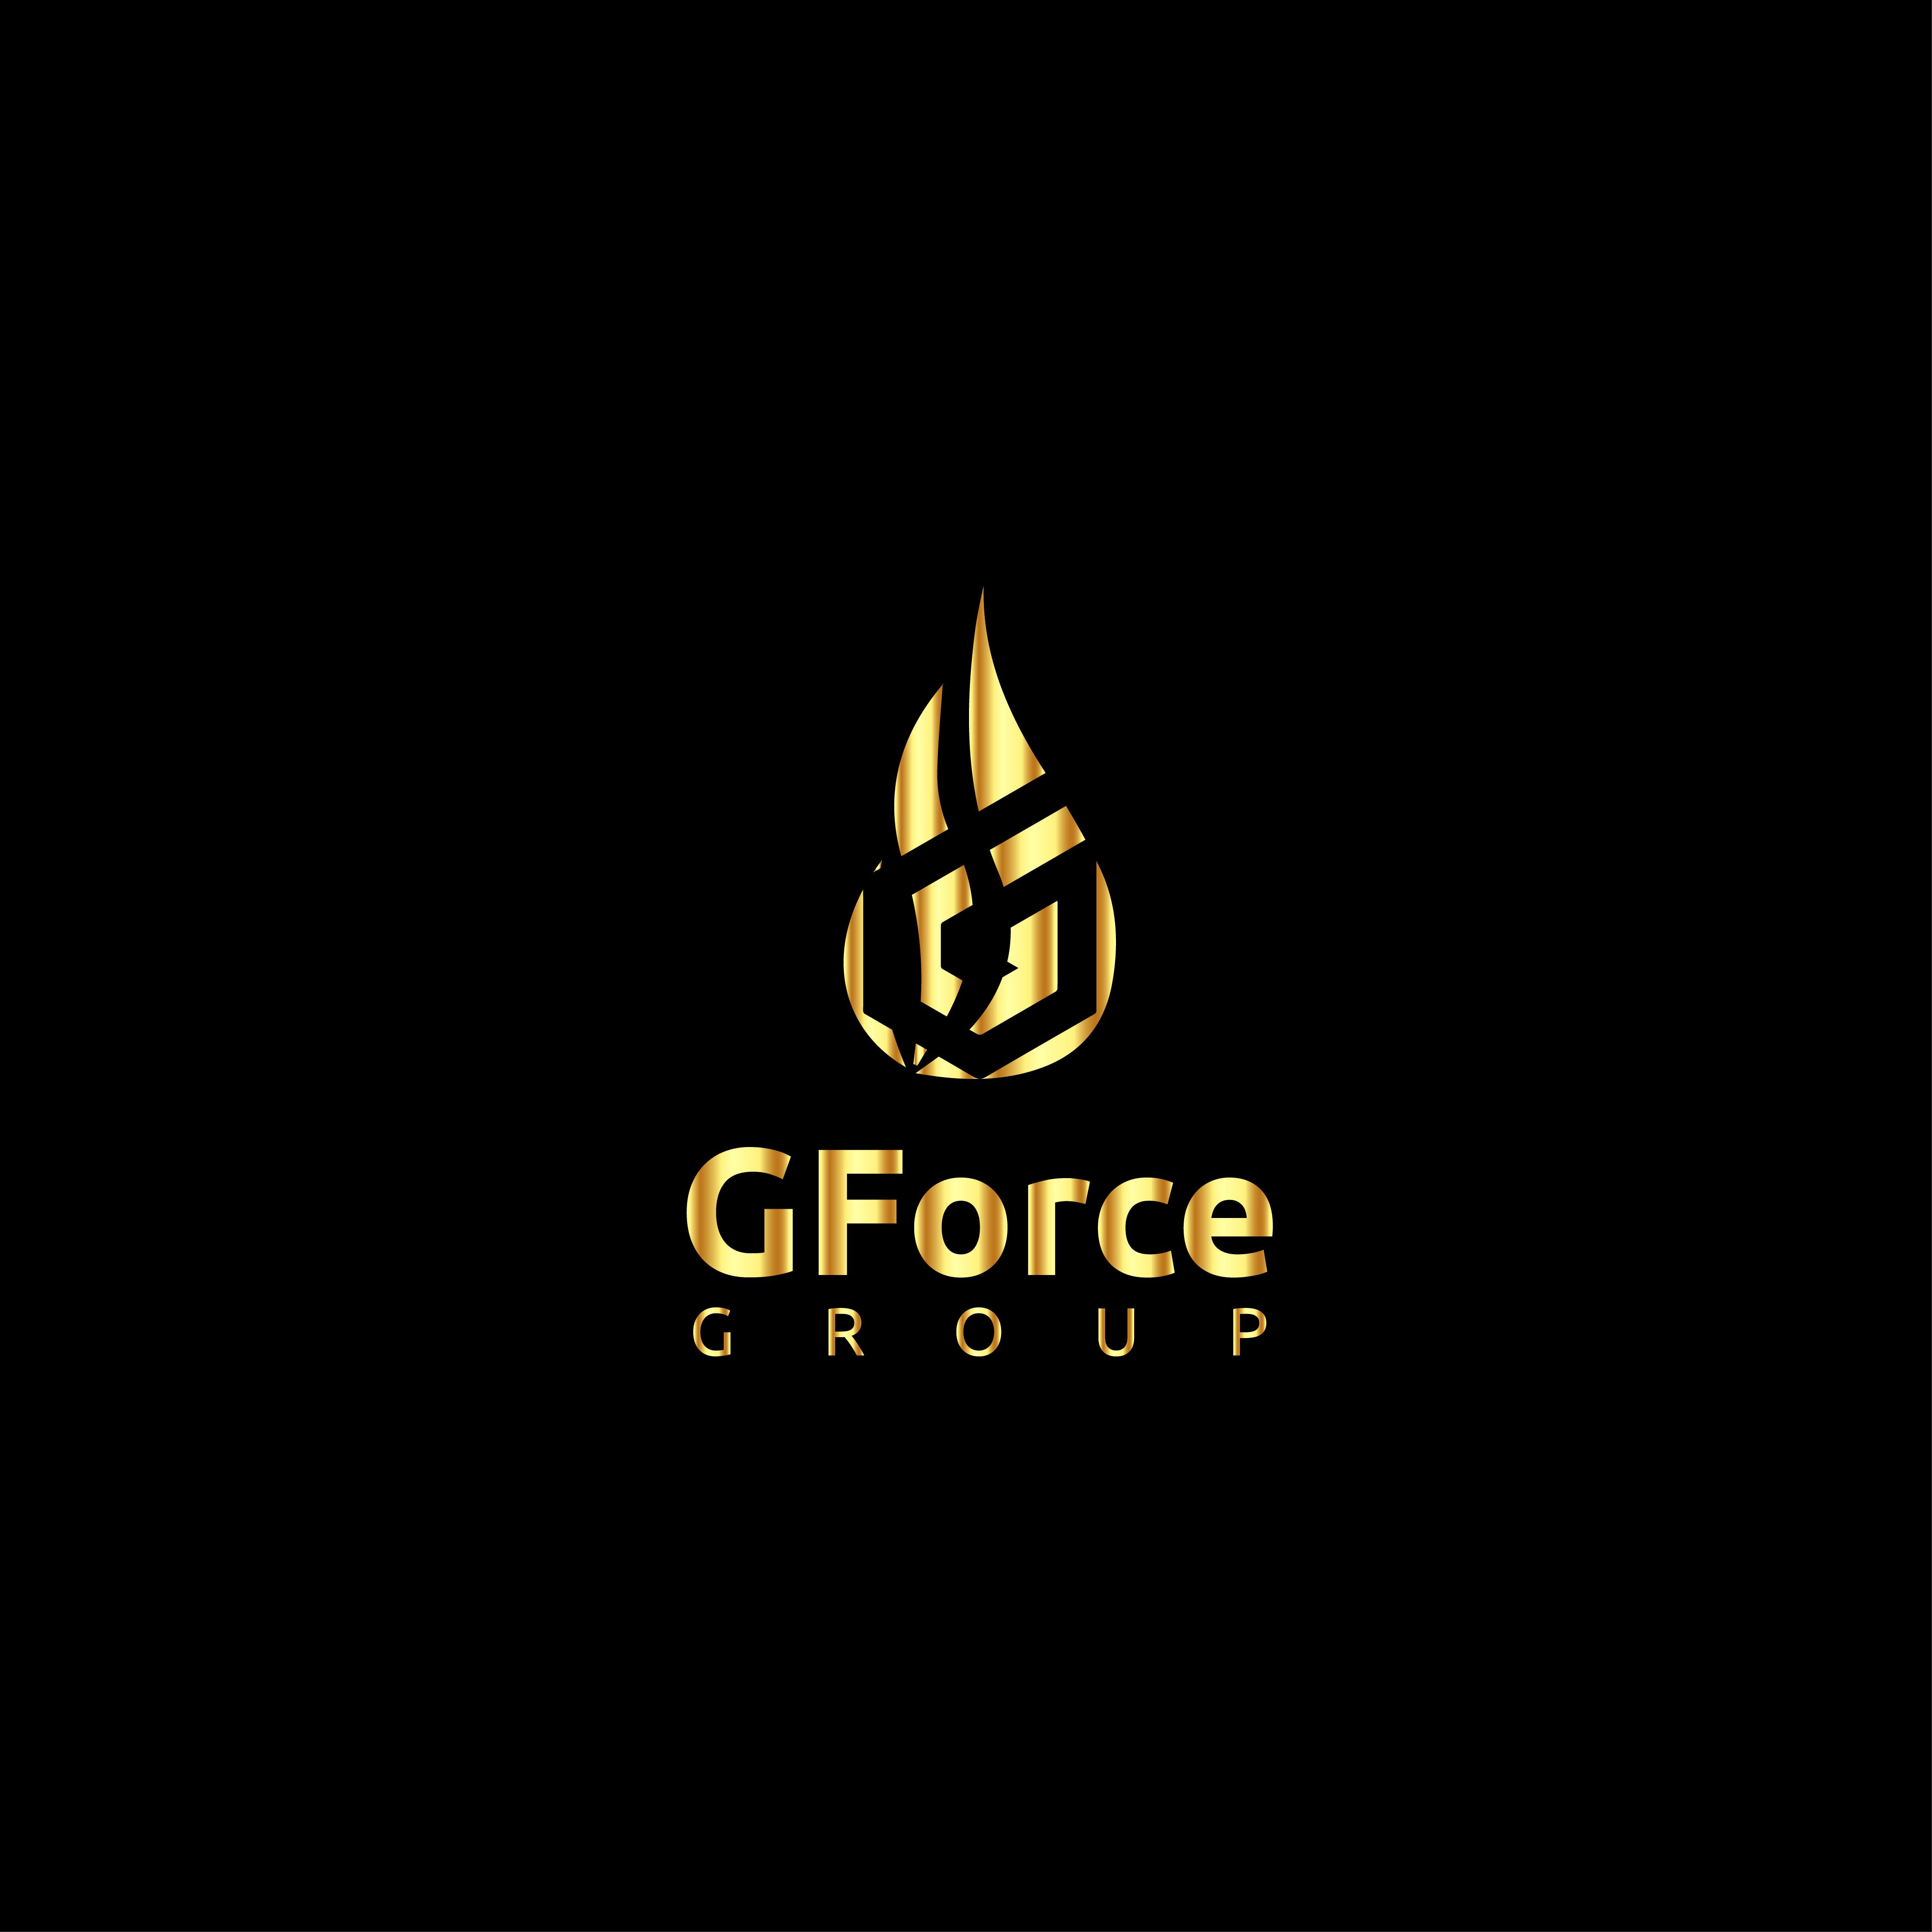 GForce Group